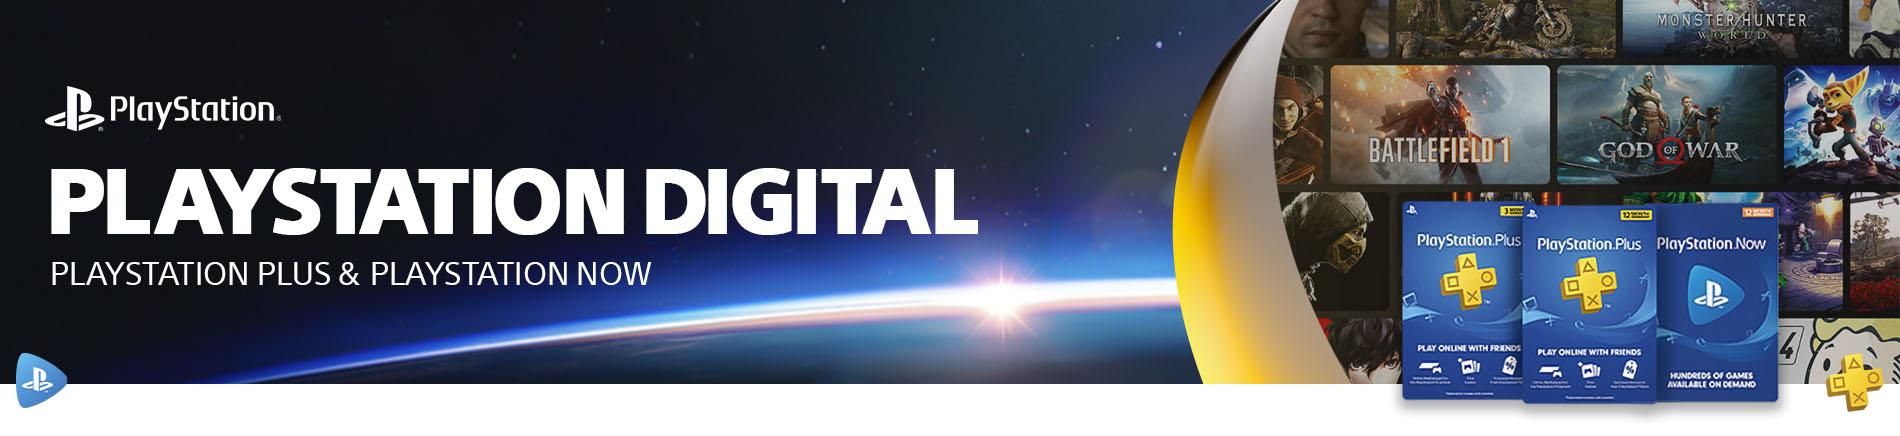 Sony Playstation Digital Card Deals Genericbanner